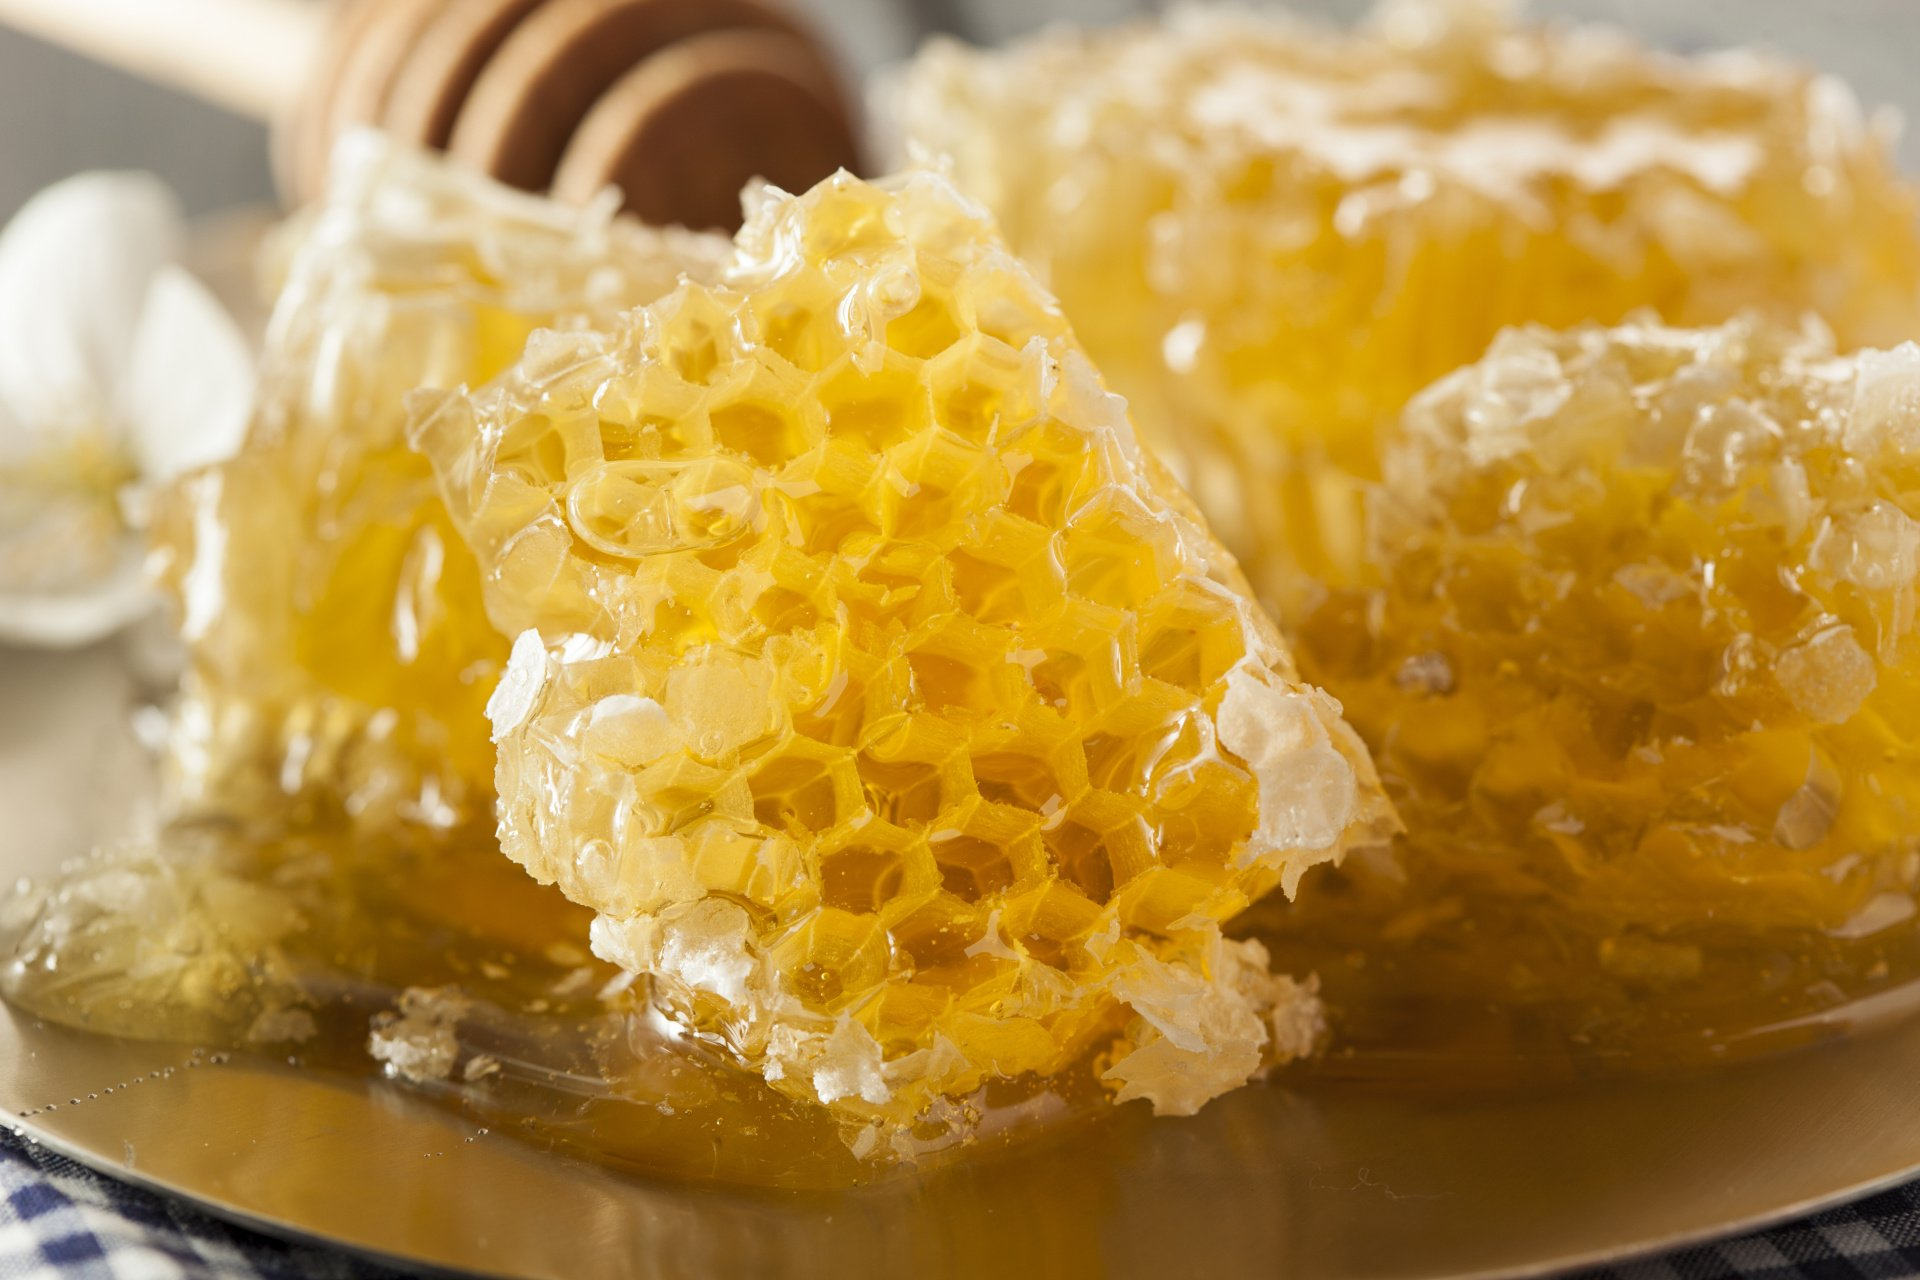 Honey, local, allergy, asthma, natural medicine, botanical, naturopathic, edina, mn, woodbury